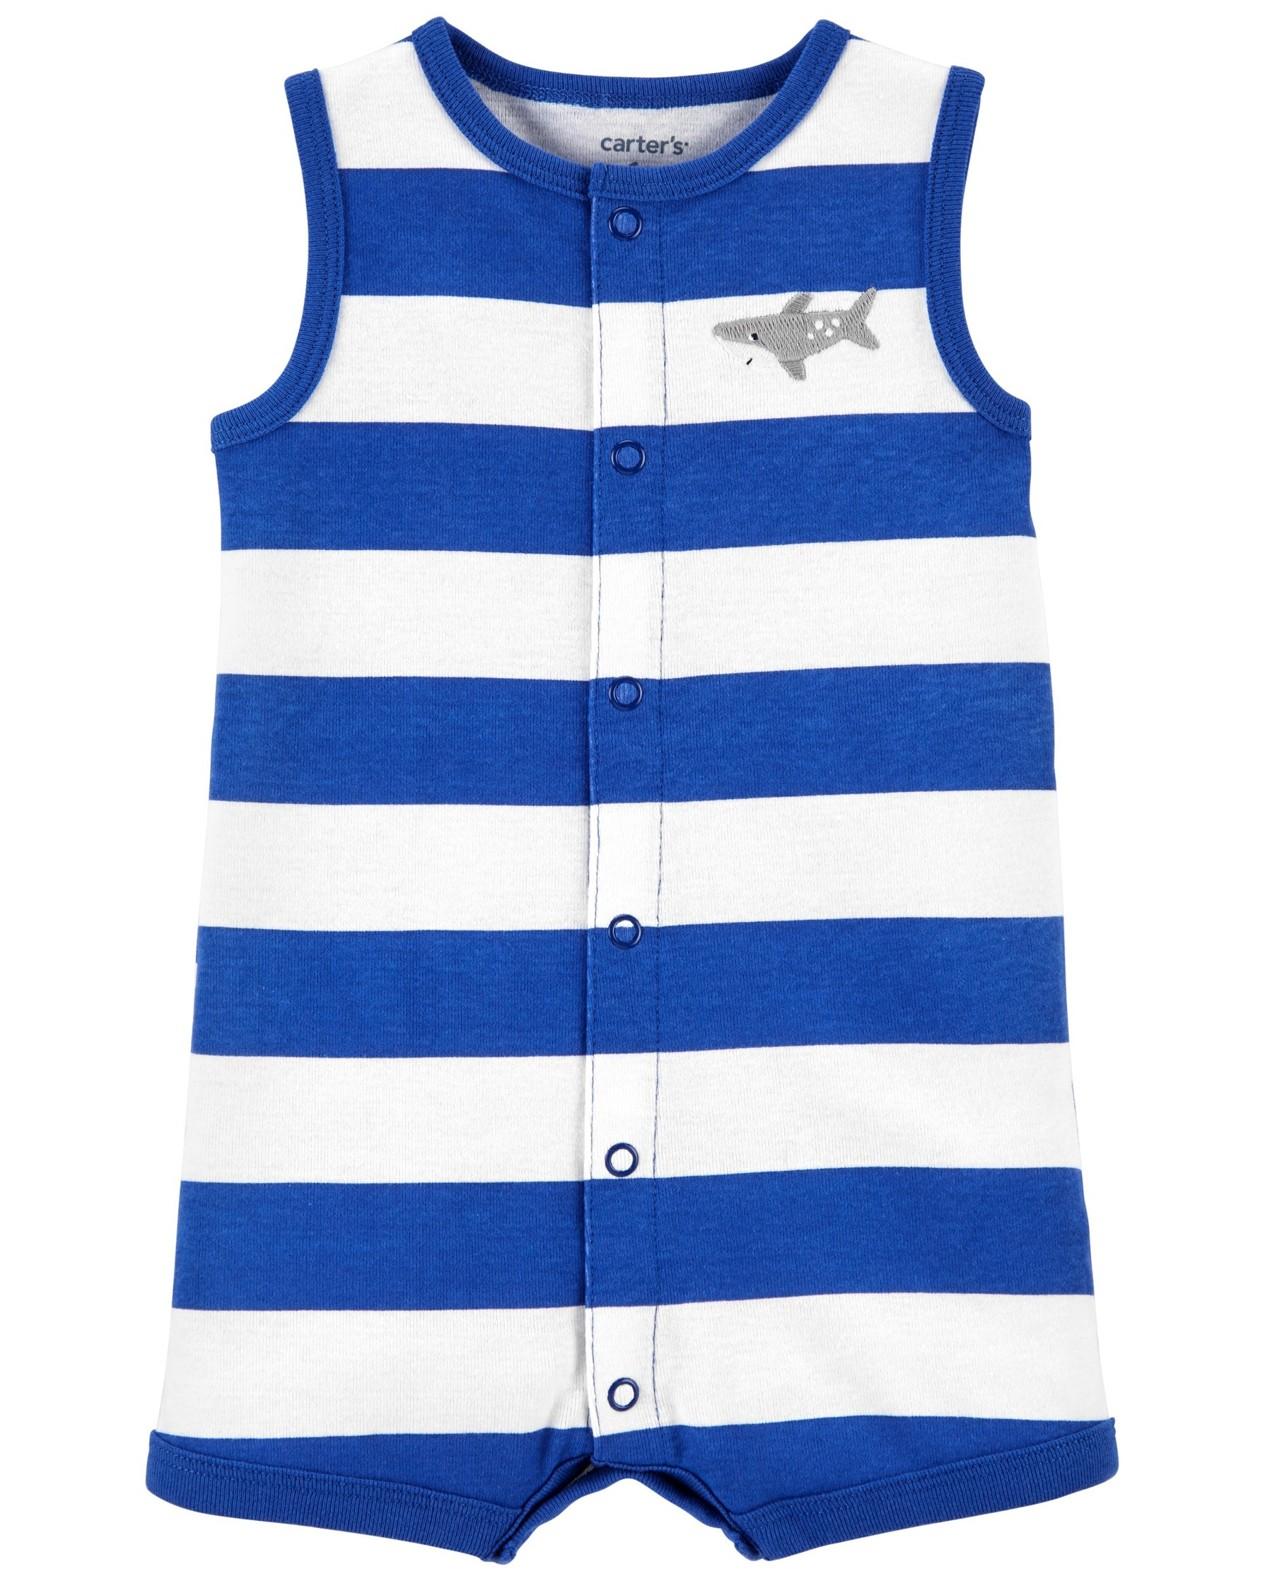 CARTER'S Opaľovačky Blue Stripe Shark chlapec 3 m, veľ. 62